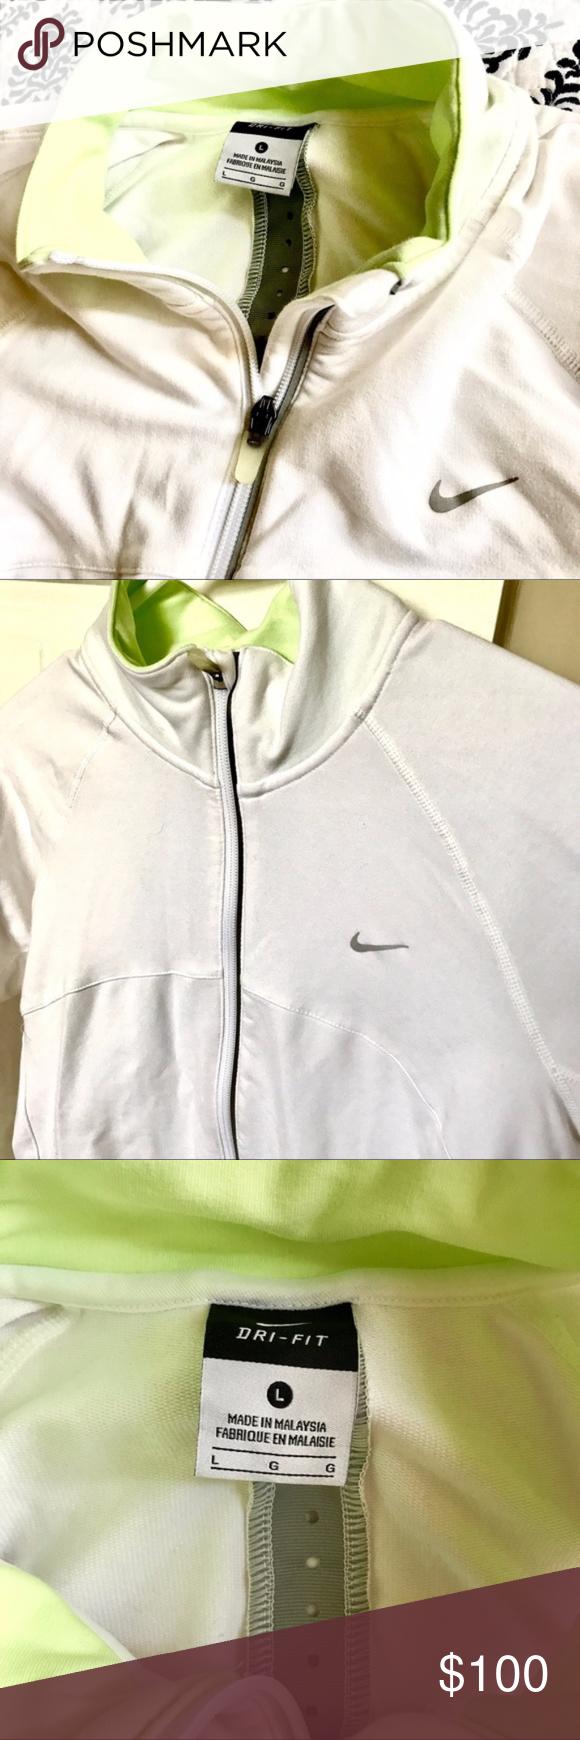 35be5f3b0 Nike Dri-FIT Thermal Full Zip Running Jacket BRAND NEW! Never worn ...